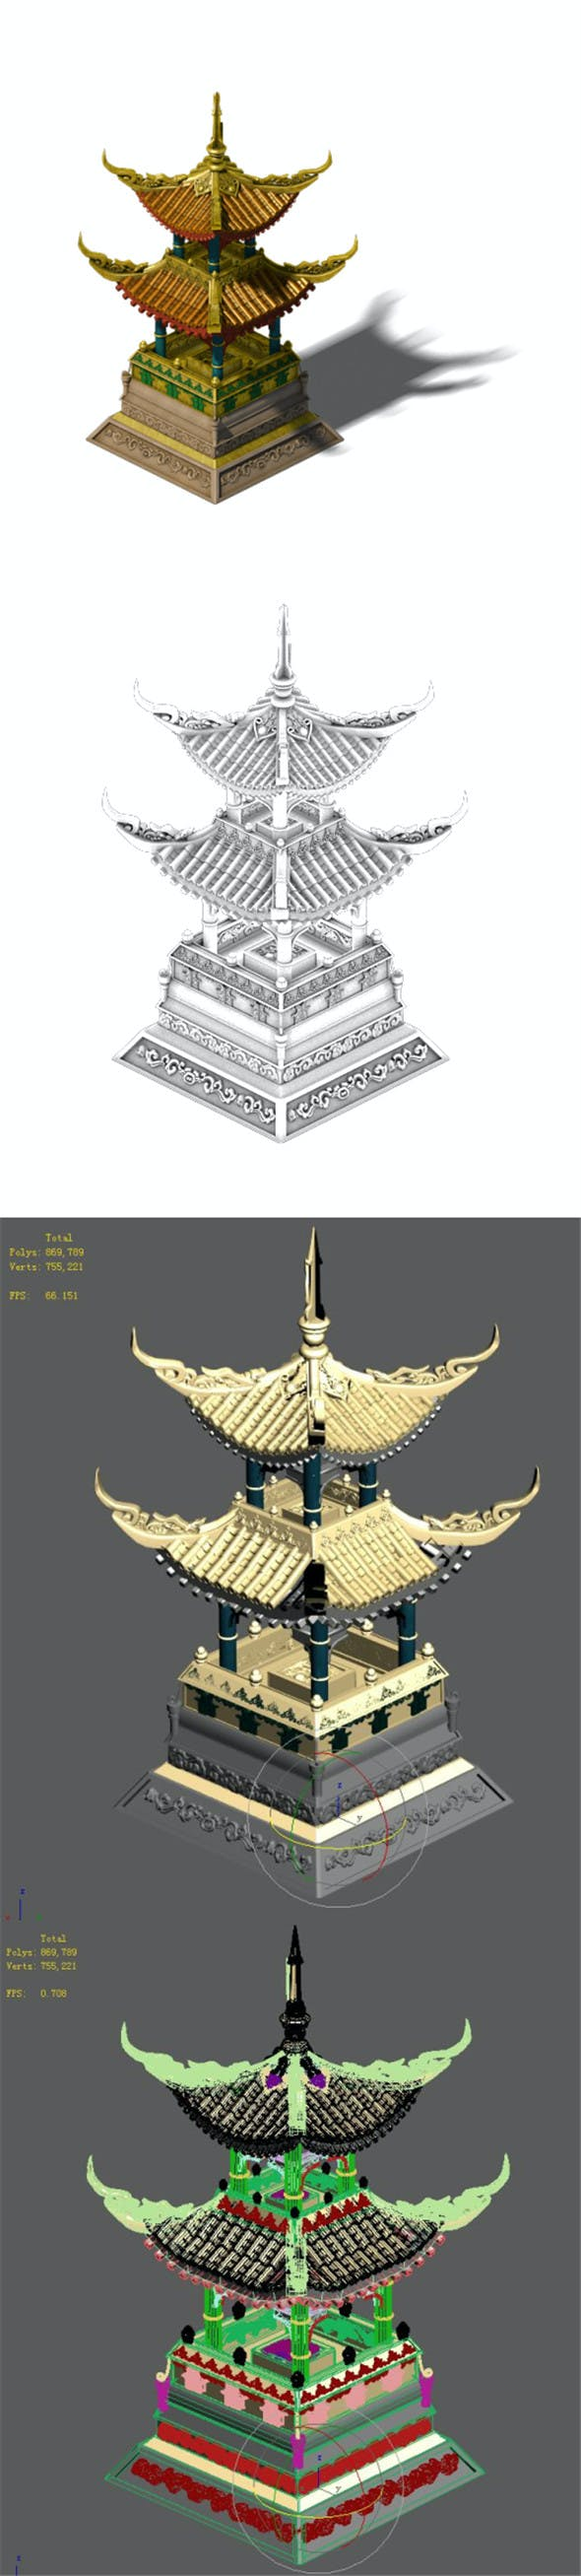 Wonderful fantasy - decorative floor lamp - 3DOcean Item for Sale